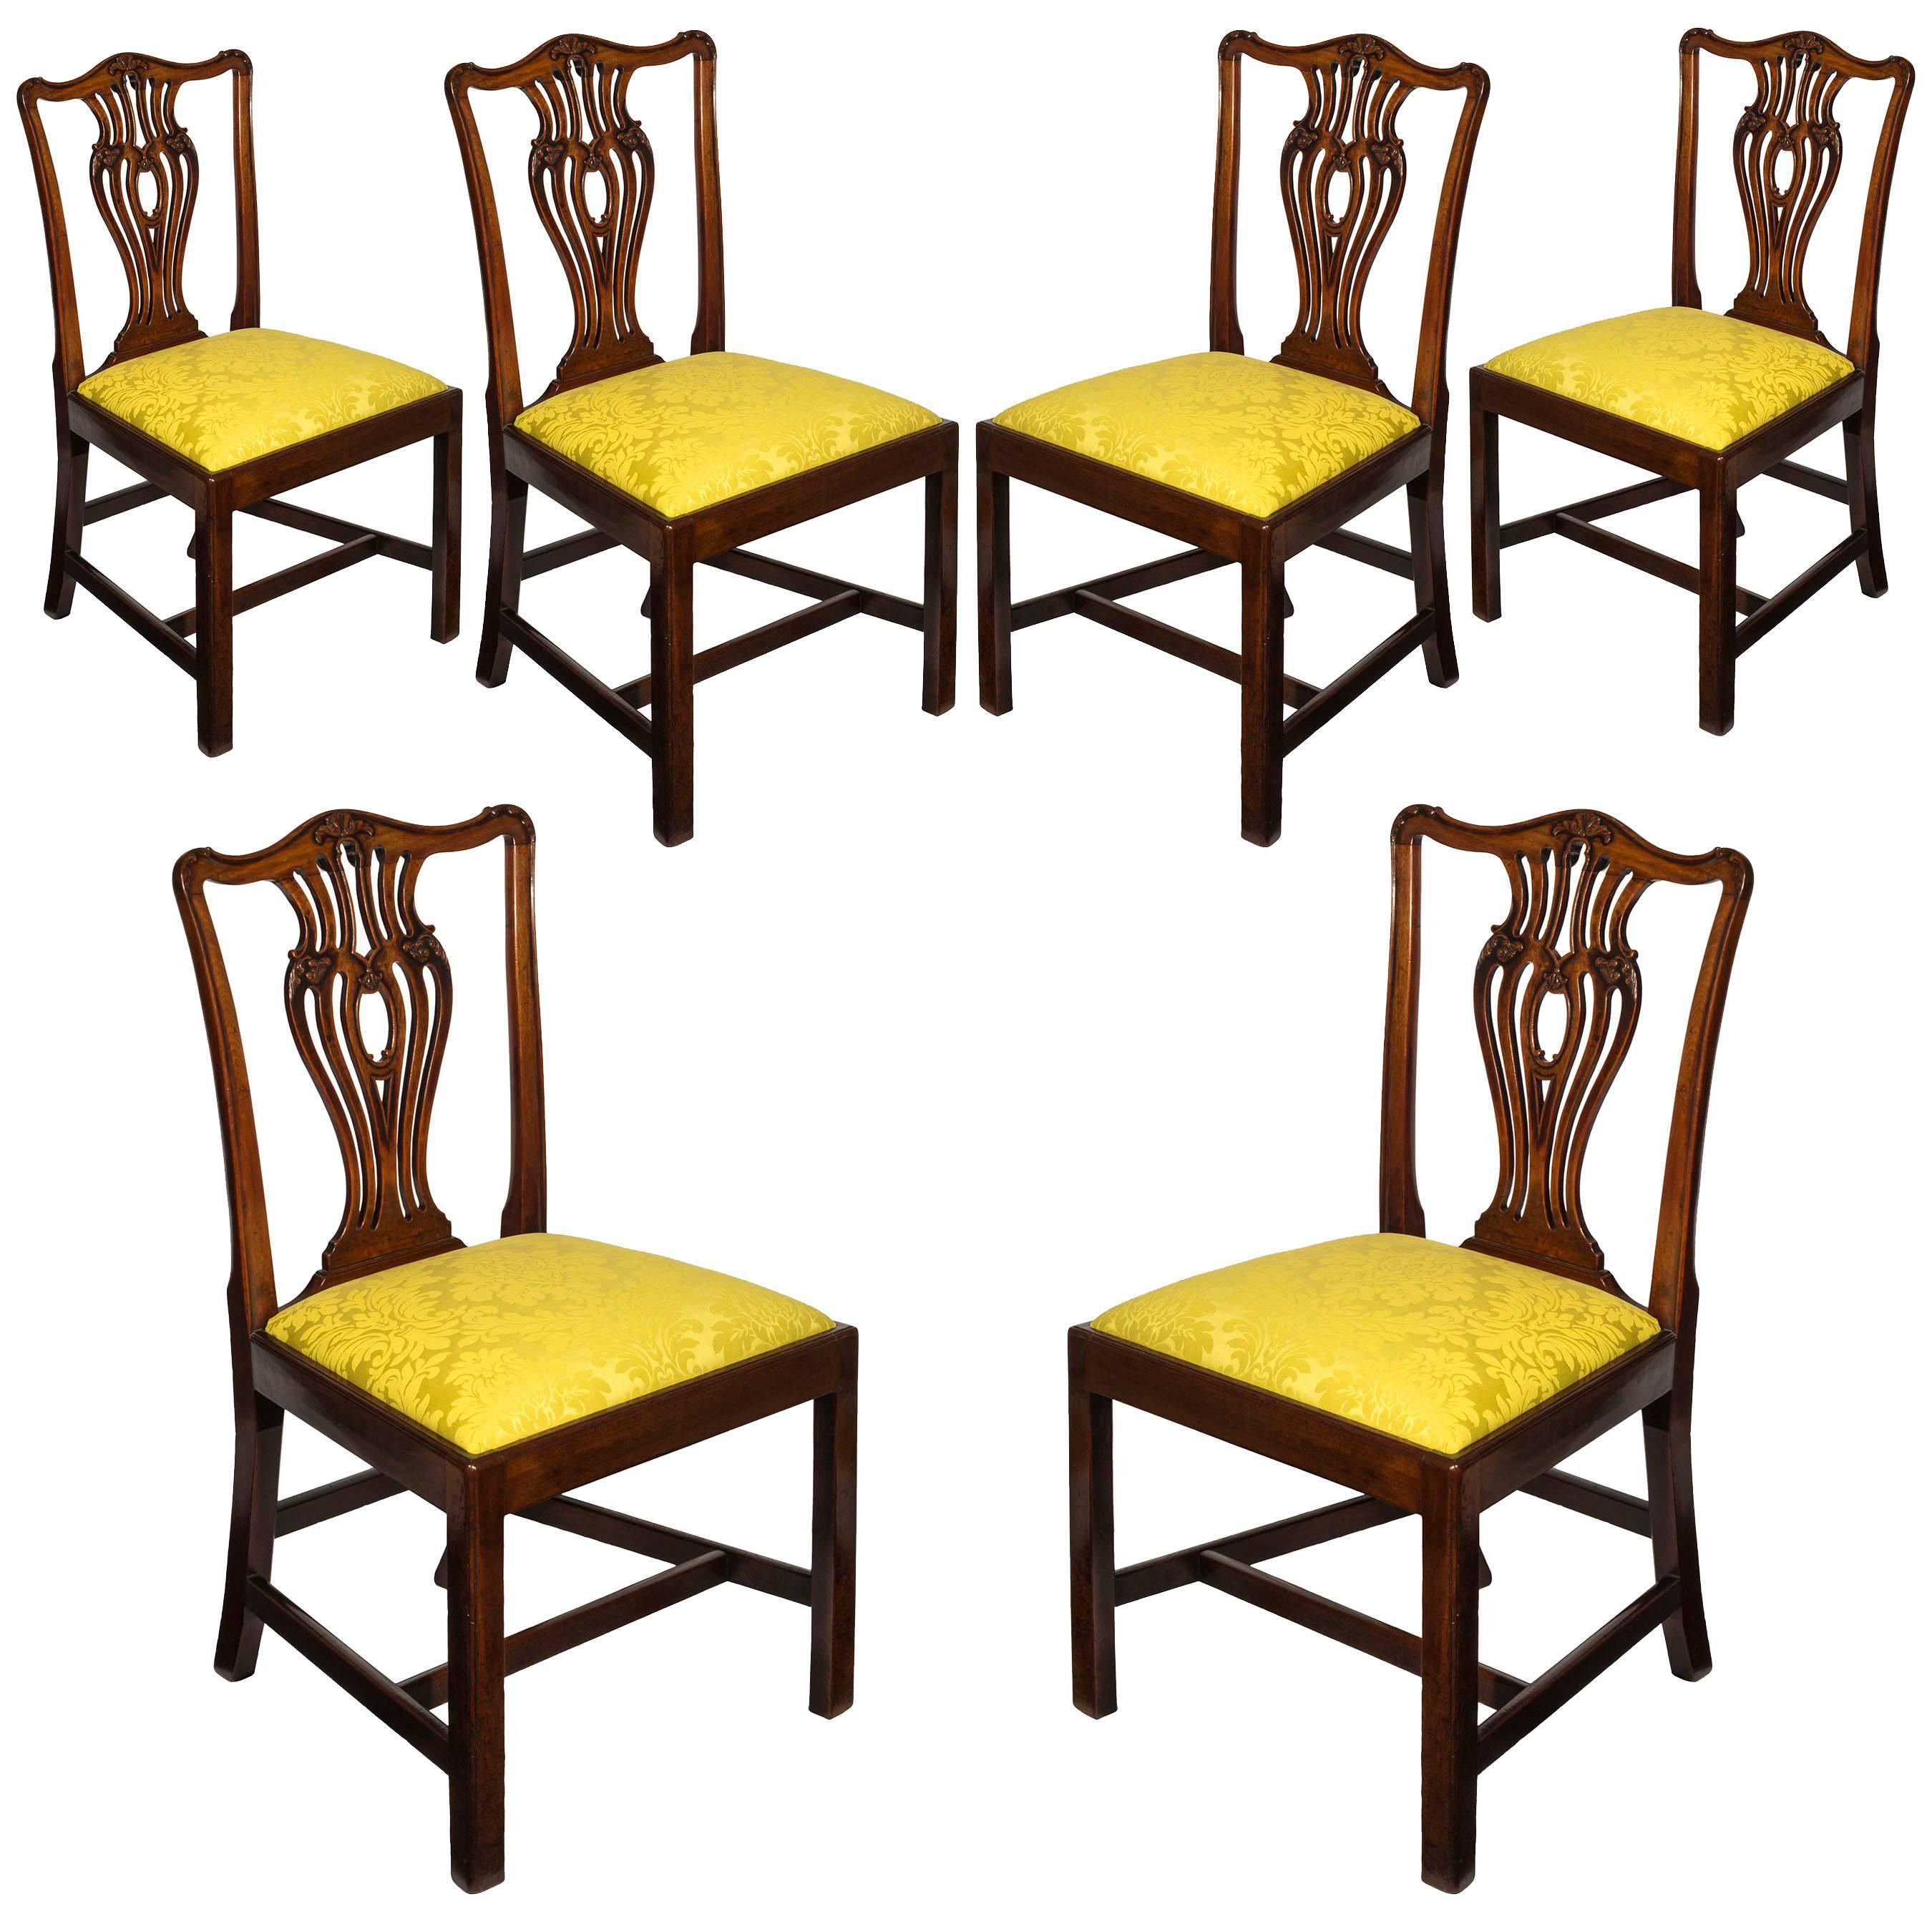 english 18th century georgian chippendale set of six elegant dining chairs